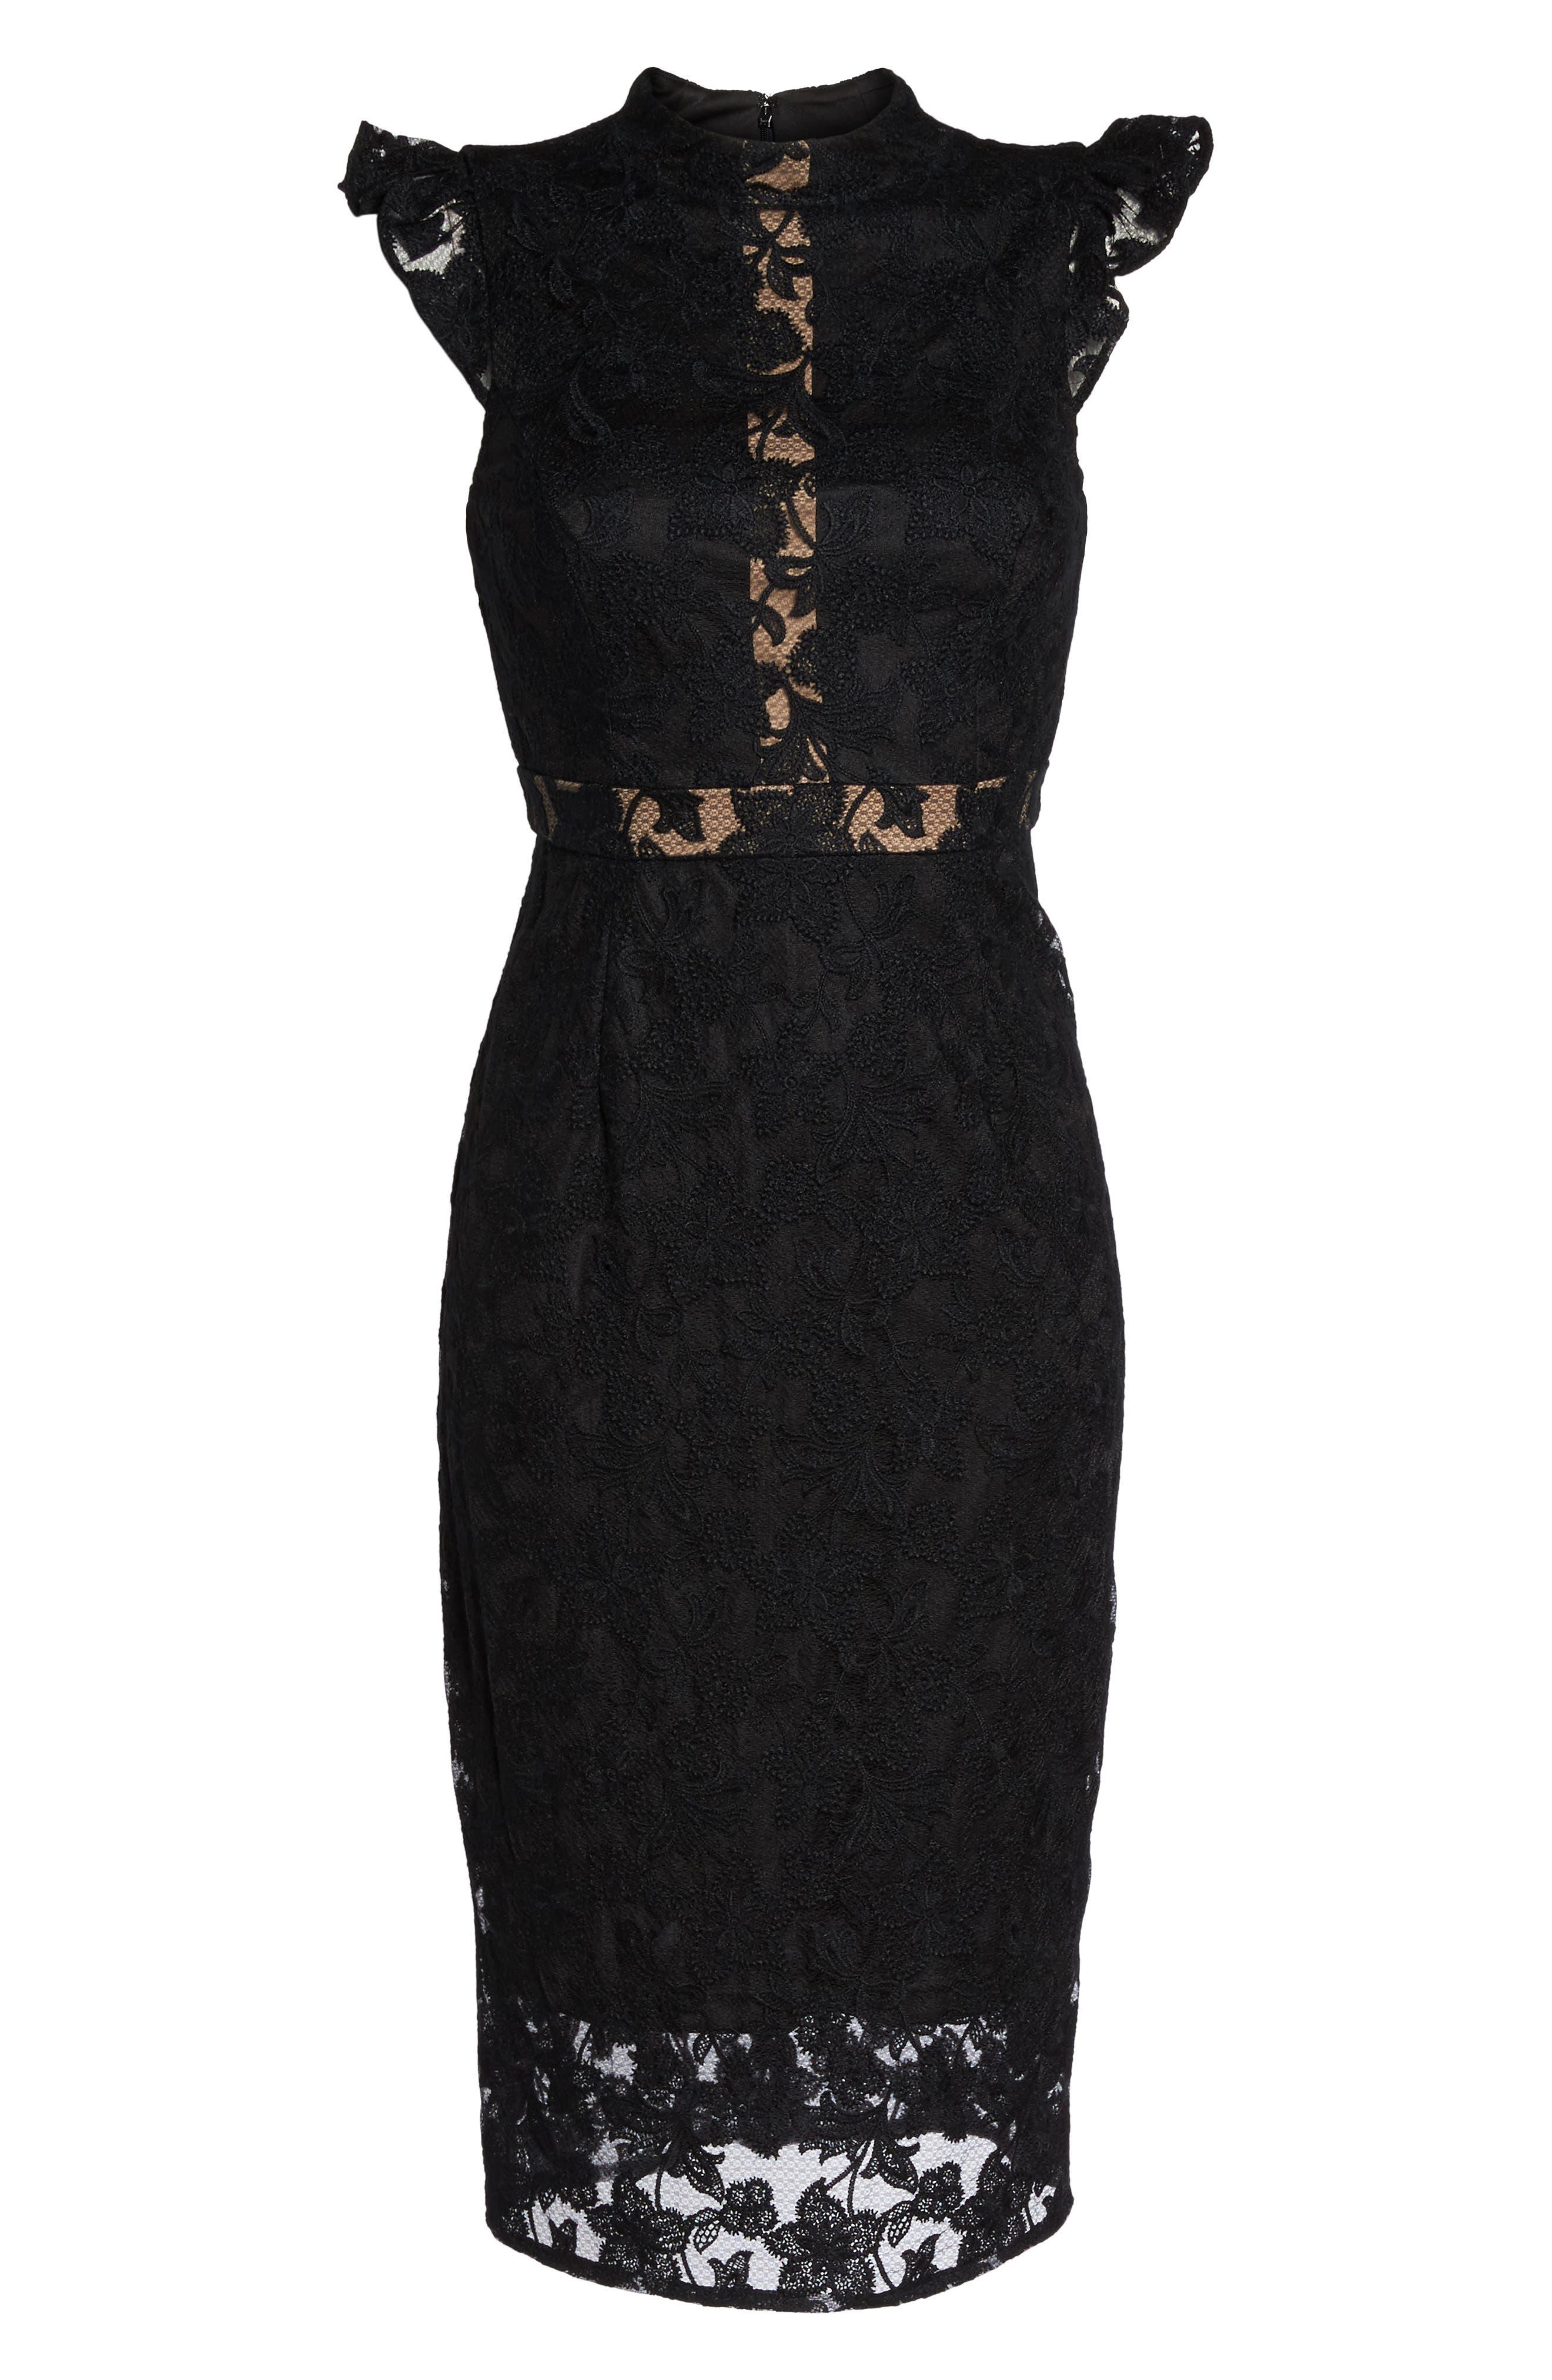 Salmone Lace Sheath Dress,                             Alternate thumbnail 6, color,                             Black/ Nude